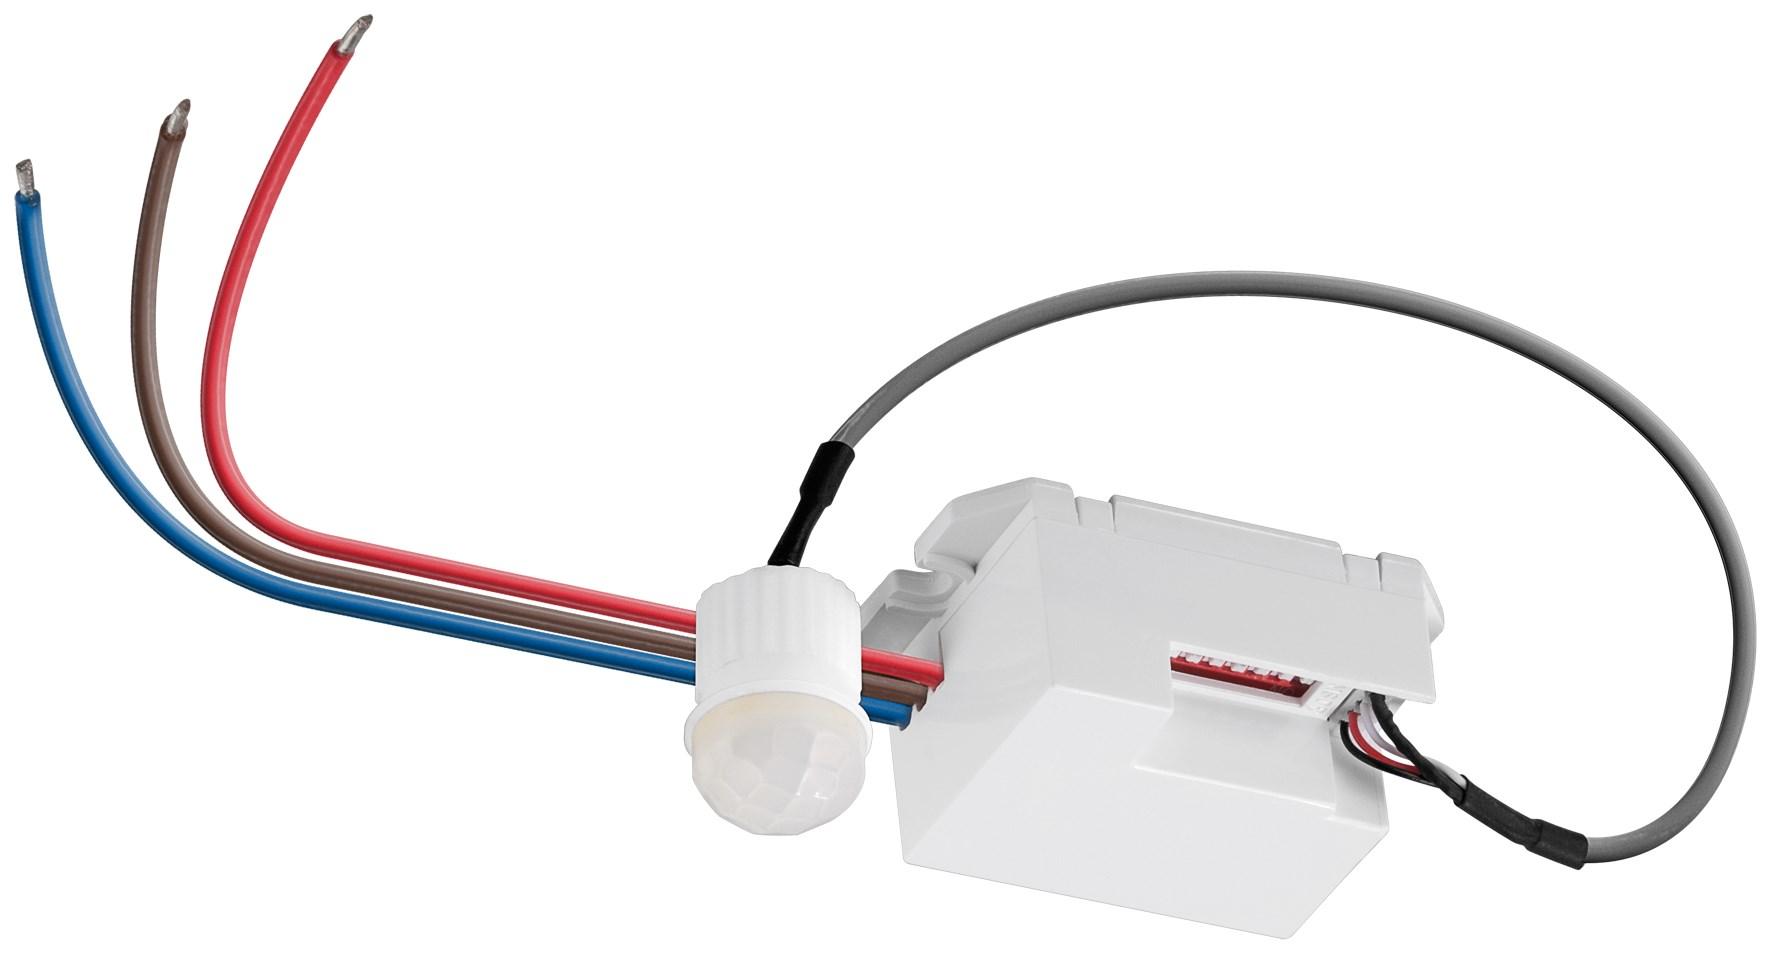 mini Led Bewegungsmelder KME 230V 1-800Watt 360° winkel lux einstellbar